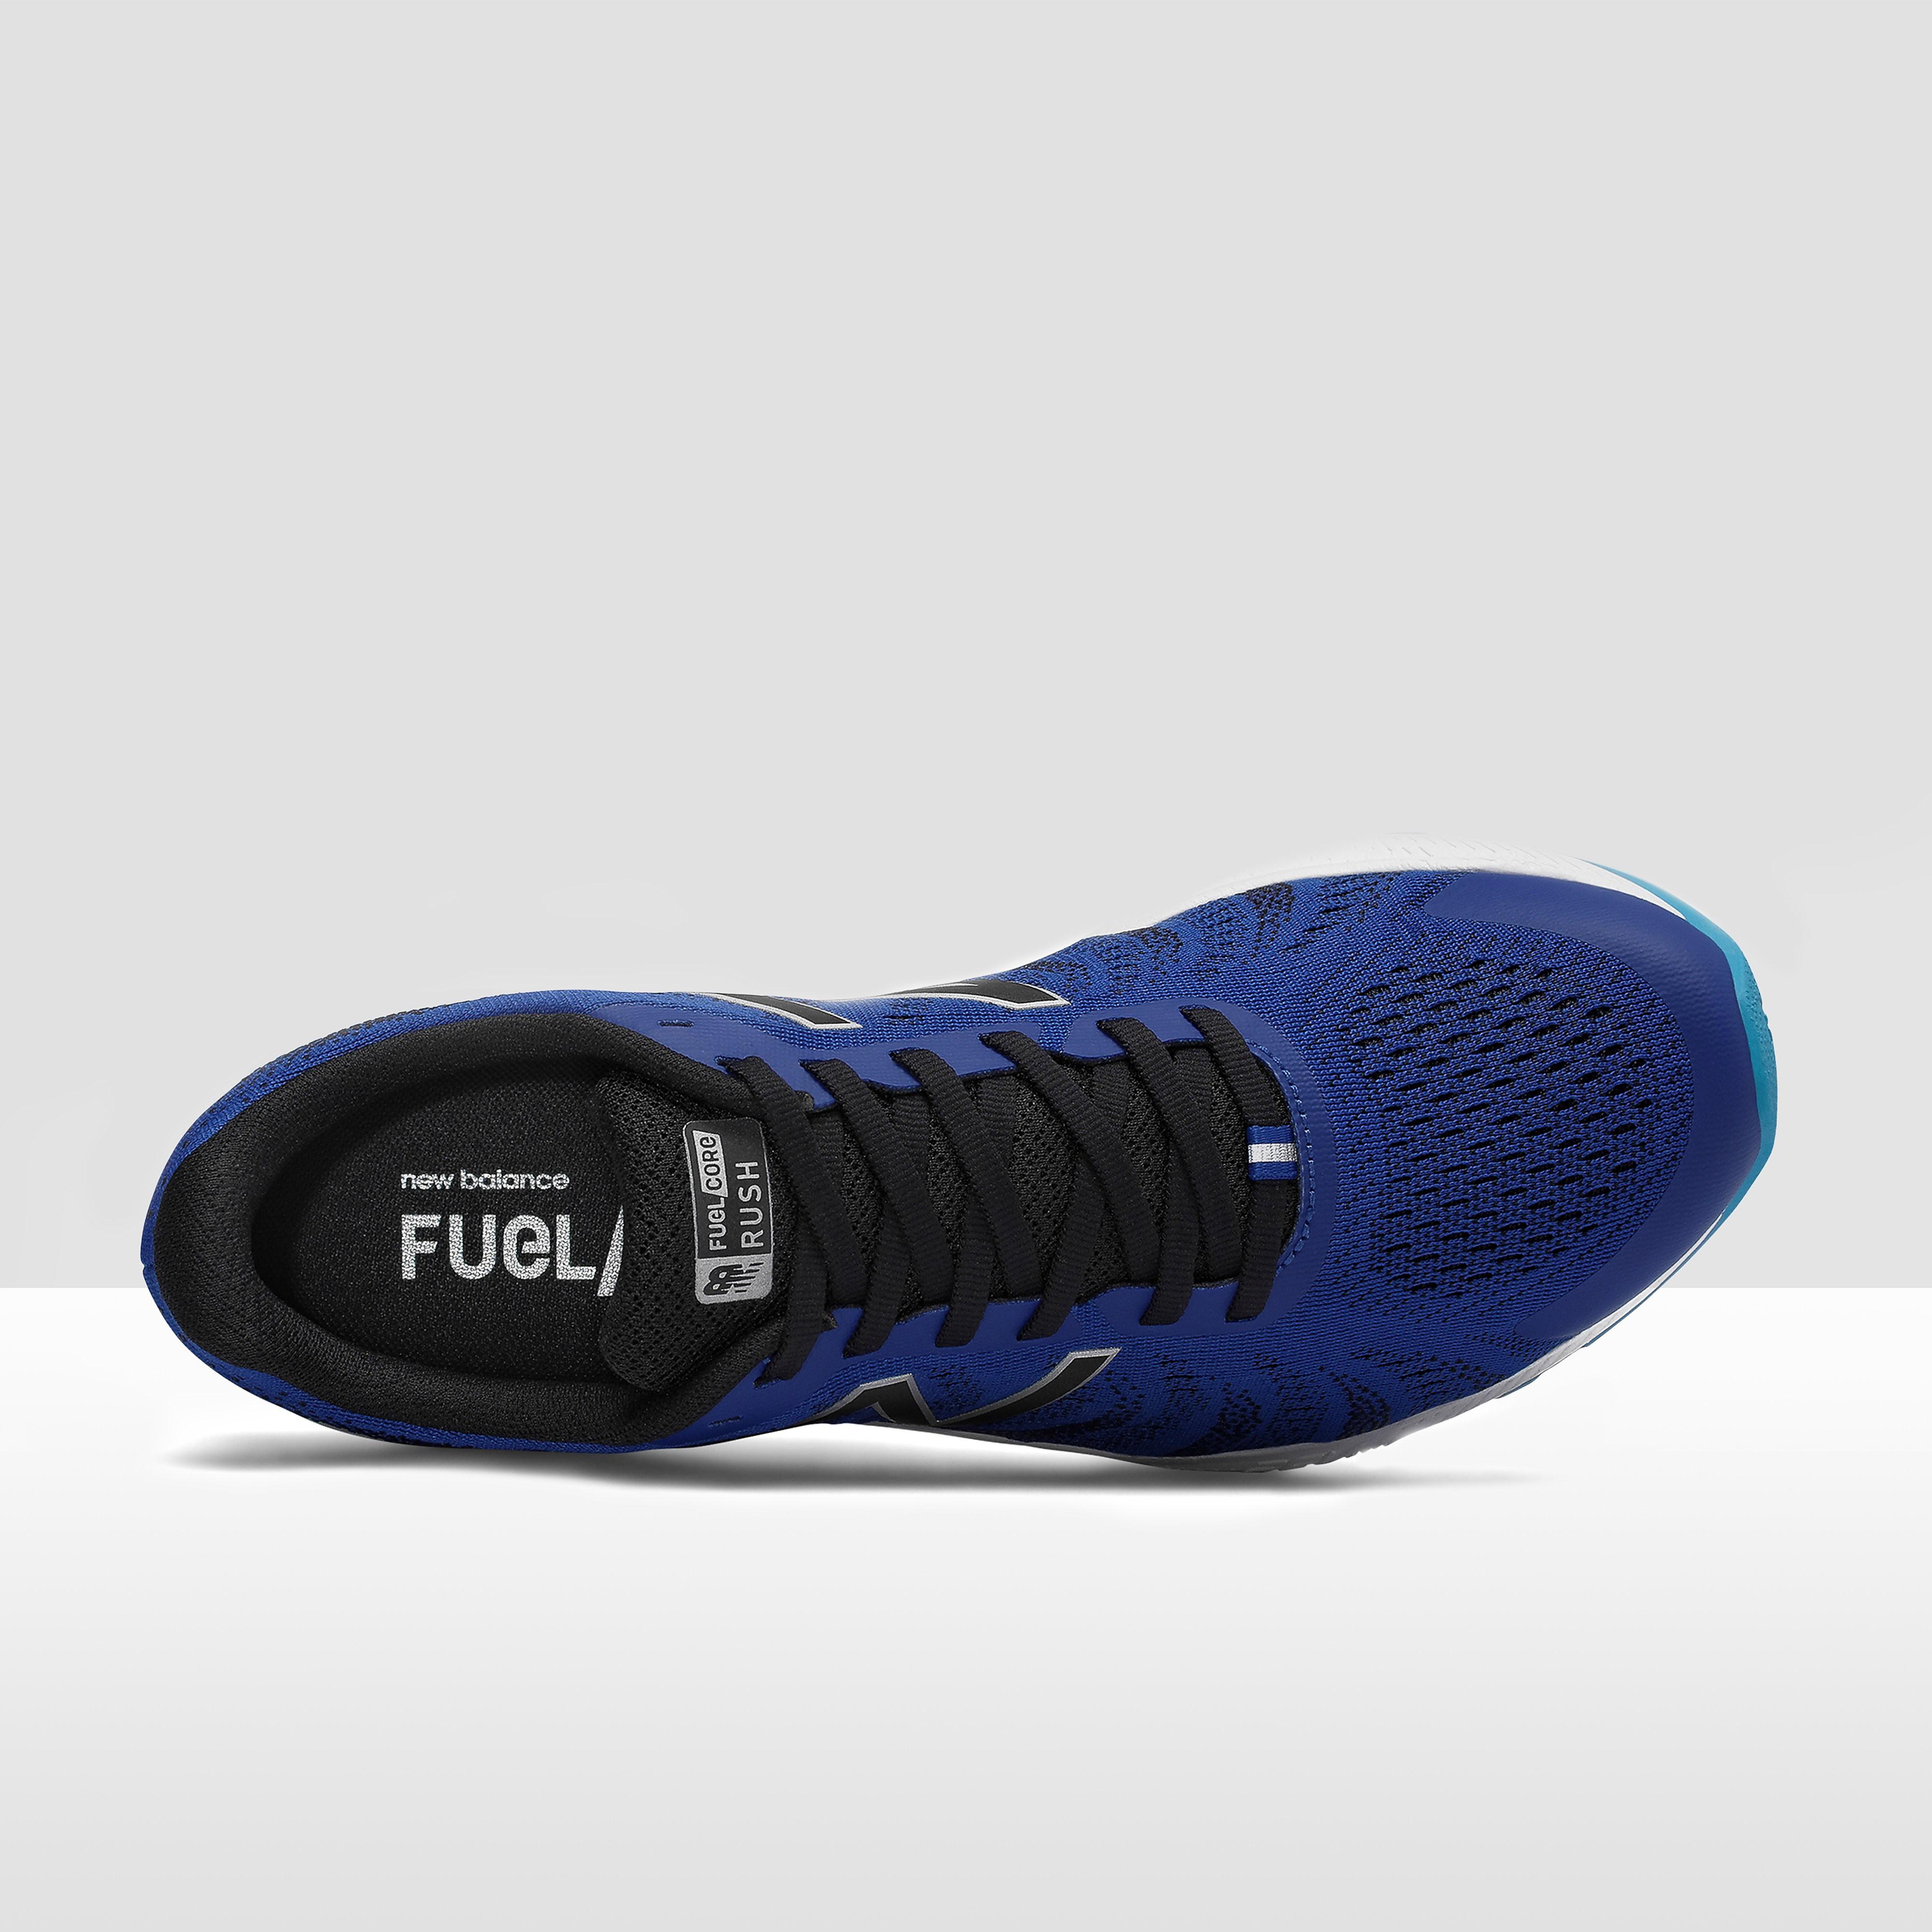 New Balance FuelCore Rush v3 Men's Running Shoes